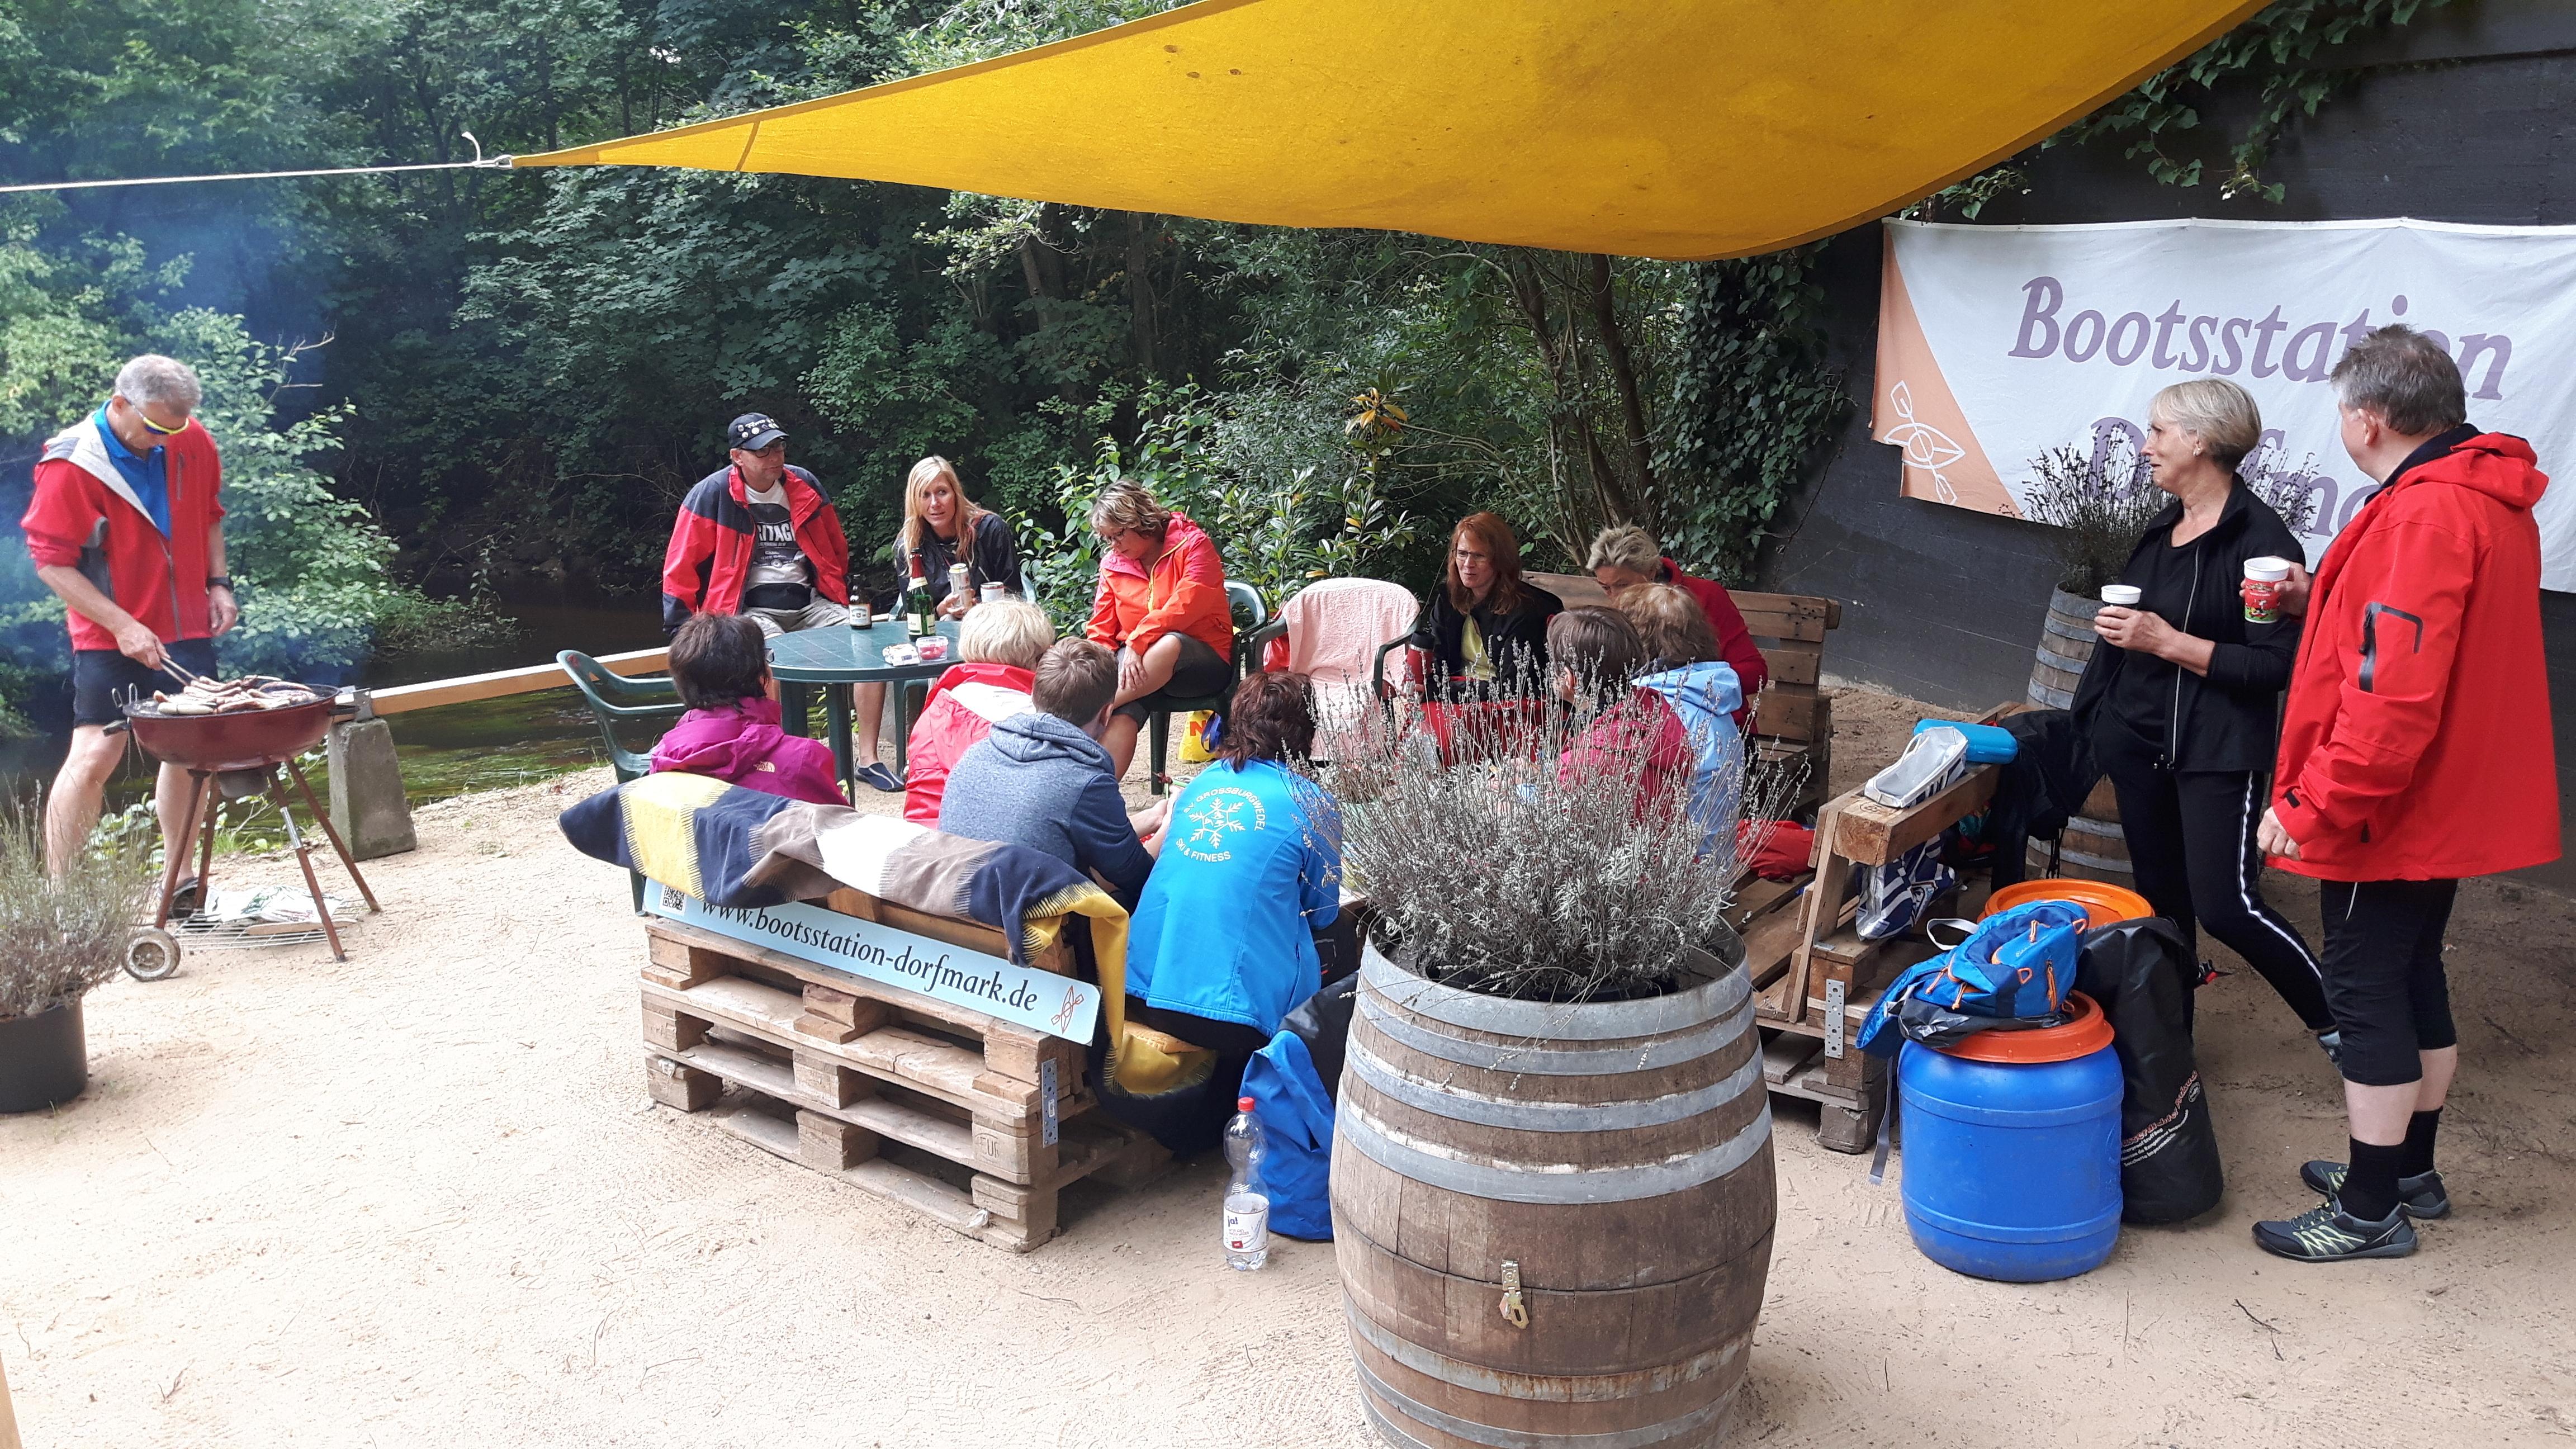 Bootsstation-Dorfmark Lounge